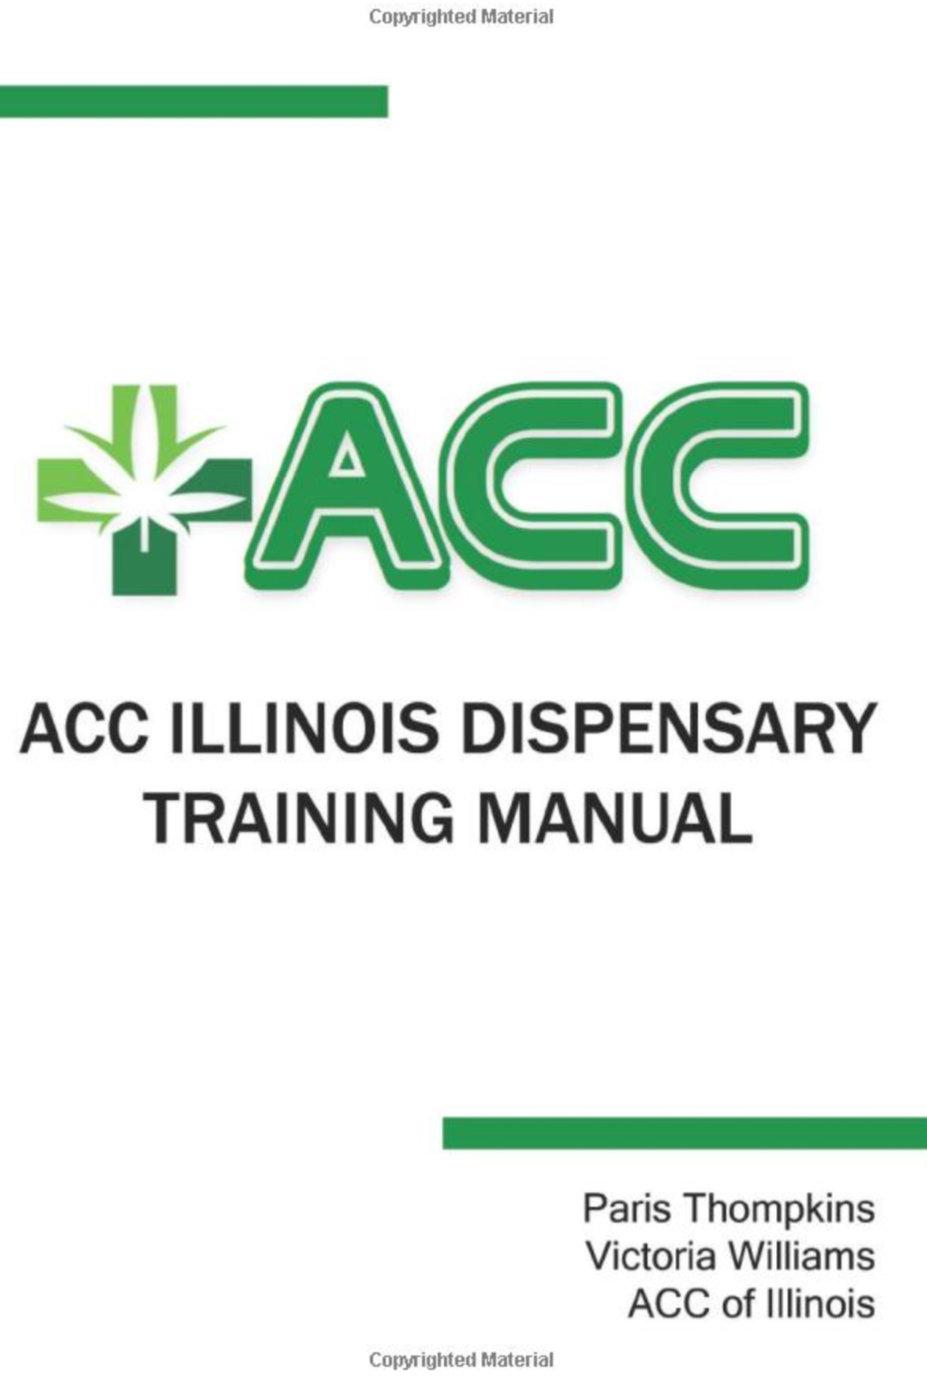 Dispensary Training Manual